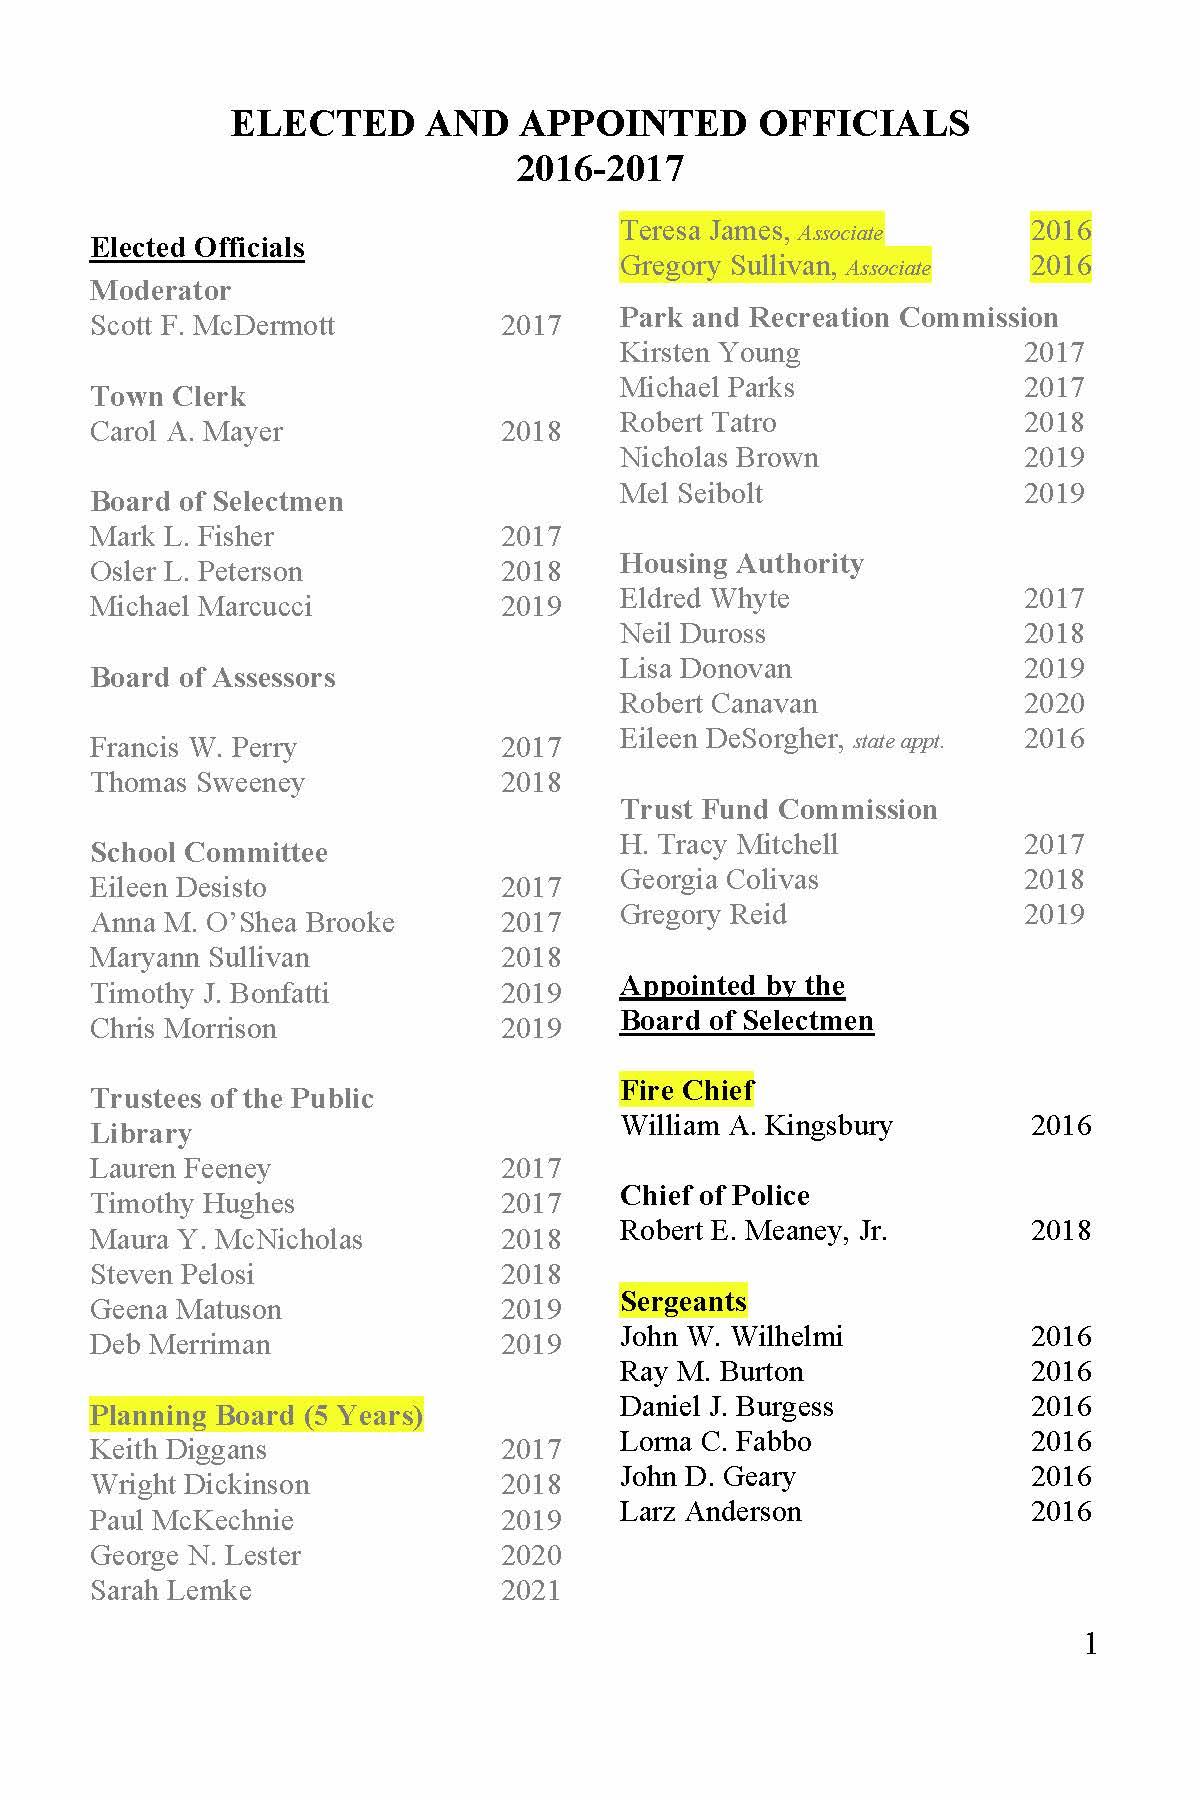 1 ELECTED AND APPOINTED OFFICIALS 2016-2017 Elected Officials Moderator Scott F. McDermott 2017 Town Clerk Carol A. Mayer 2018 Board of Selectmen Mark L. Fisher 2017 Osler L. Peterson 2018 Michael Marcucci 2019 Board of Assessors Francis W. Perry 2017 Thomas Sweeney 2018 School Committee Eileen Desisto 2017 Anna M. O'Shea Brooke 2017 Maryann Sullivan 2018 Timothy J. Bonfatti 2019 Chris Morrison 2019 Trustees of the Public Library Lauren Feeney 2017 Timothy Hughes 2017 Maura Y. McNicholas 2018 Steven Pelosi 2018 Geena Matuson 2019 Deb Merriman 2019 Planning Board (5 Years) Keith Diggans 2017 Wright Dickinson 2018 Paul McKechnie 2019 George N. Lester 2020 Sarah Lemke 2021 Teresa James, Associate 2016 Gregory Sullivan, Associate 2016 Park and Recreation Commission Kirsten Young 2017 Michael Parks 2017 Robert Tatro 2018 Nicholas Brown 2019 Mel Seibolt 2019 Housing Authority Eldred Whyte 2017 Neil Duross 2018 Lisa Donovan 2019 Robert Canavan 2020 Eileen DeSorgher, state appt. 2016 Trust Fund Commission H. Tracy Mitchell 2017 Georgia Colivas 2018 Gregory Reid 2019 Appointed by the Board of Selectmen Fire Chief William A. Kingsbury 2016 Chief of Police Robert E. Meaney, Jr. 2018 Sergeants John W. Wilhelmi 2016 Ray M. Burton 2016 Daniel J. Burgess 2016 Lorna C. Fabbo 2016 John D. Geary 2016 Larz Anderson 2016 2 Police Officers Michelle Manganello 2016 Christine DiNatale 2016 Robert G. Flaherty 2016 Dana P. Friend 2016 Thomas M. LaPlante 2016 Wayne Sallale 2016 Colby Roy 2016 Ryan Maxfield 2016 Joseph Brienze 2016 Patrick Keleher 2016 Town Administrator Michael J. Sullivan 2017 Treasurer/Collector Georgia K. Colivas 2017 Superintendent of Public Works Kenneth P. Feeney 2016 Town Accountant Joy Ricciuto 2016 Town Counsel Mark G. Cerel 2016 Affordable Housing Committee Bonnie Wren-Burgess 2016 Charles H. Peck 2016 Diane L. Maxson 2016 Stephen M. Nolan 2016 John W. McGeorge 2016 Fred Bunger 2016 Ann B. Thompson 2016 Kristine Trierweiler, Ex Officio 2016 Americans with Disabilit